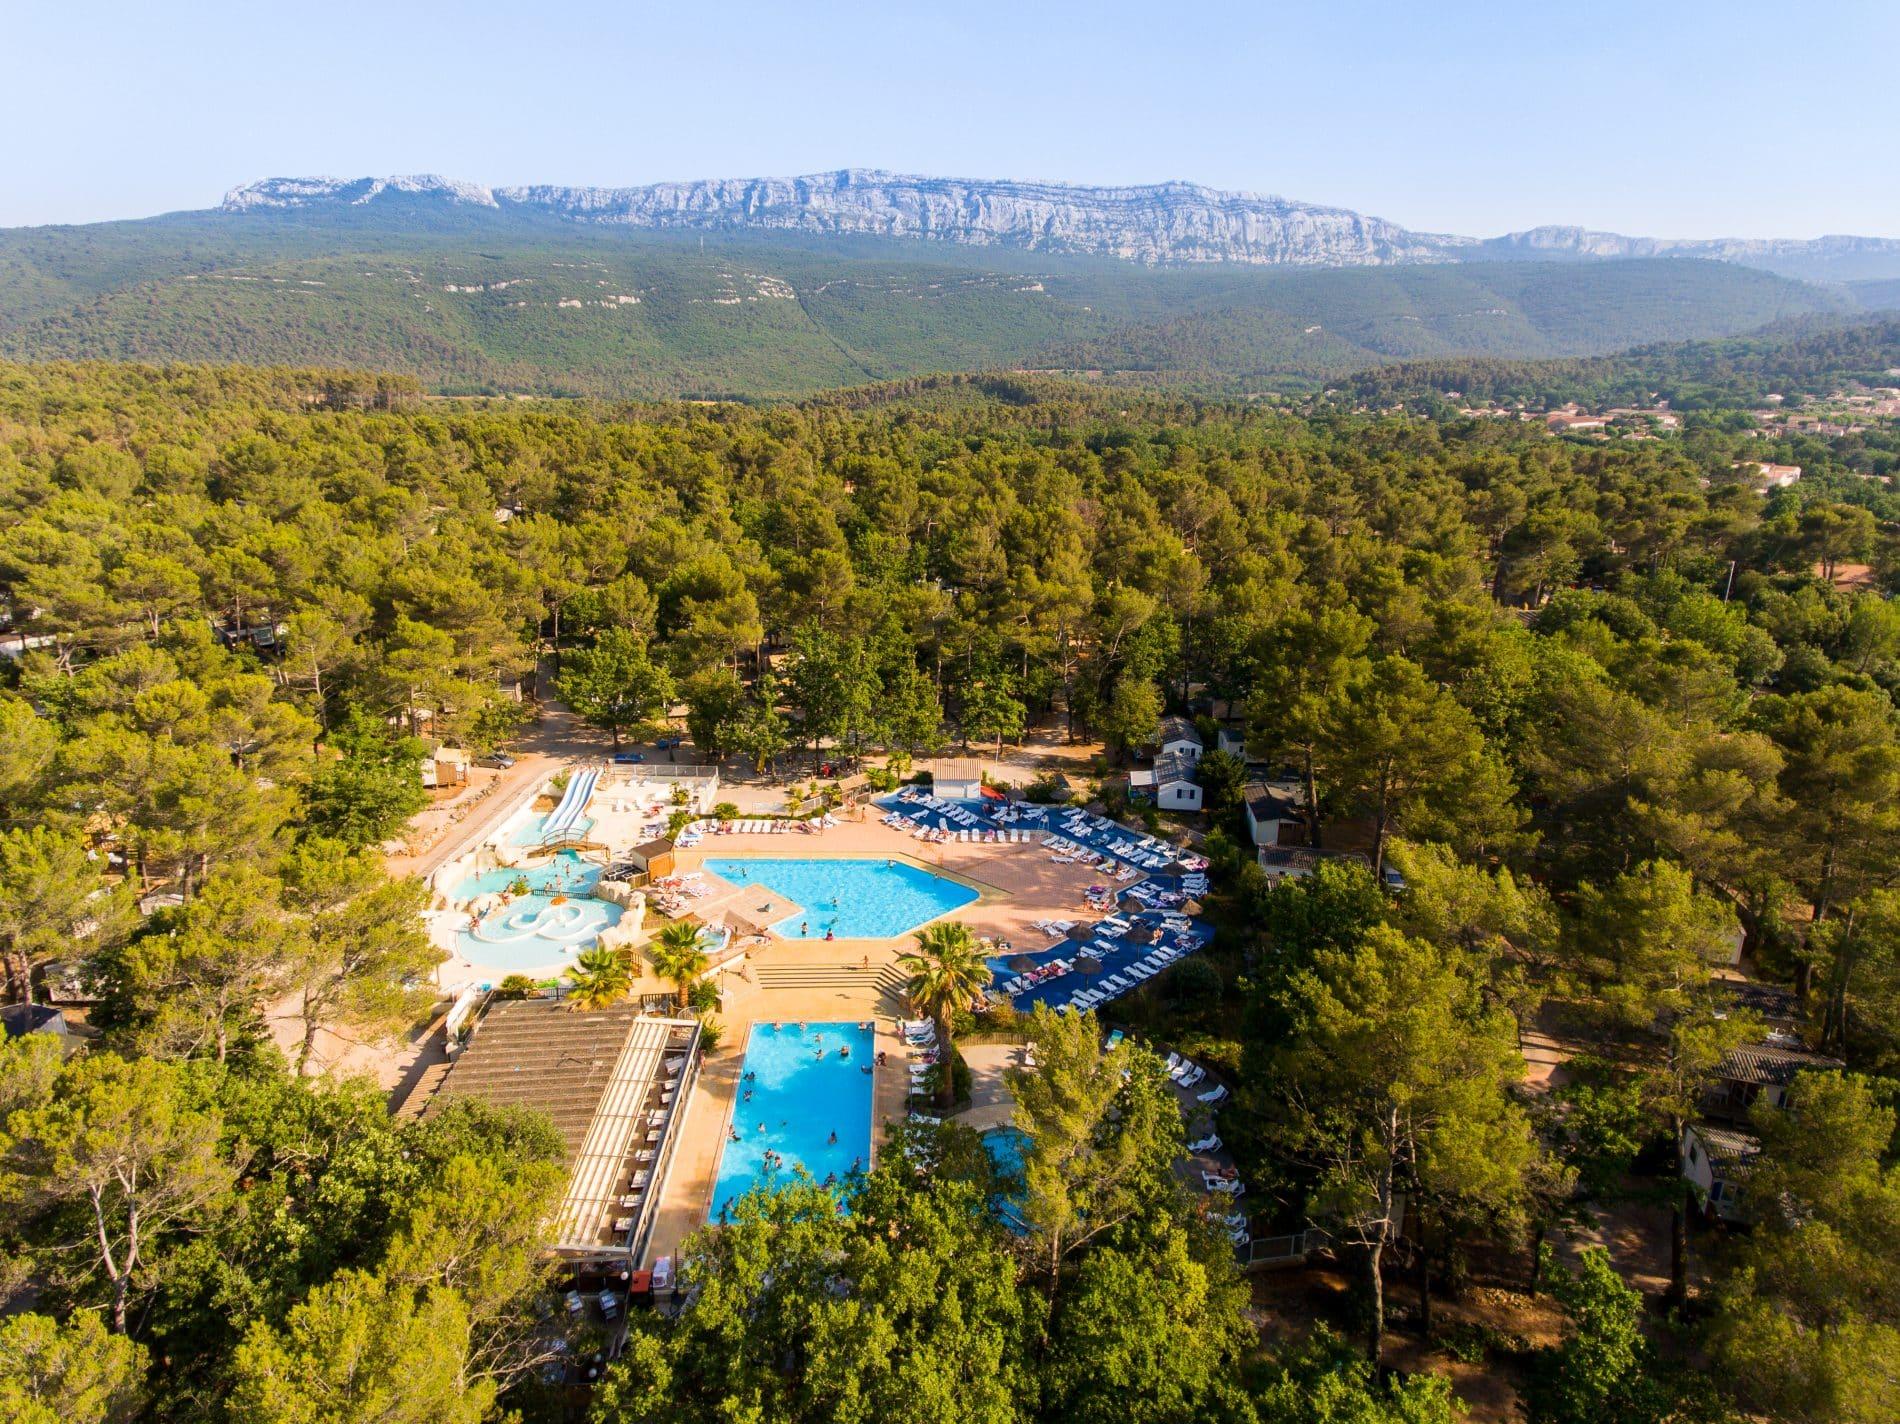 Camping | Massif de la Sainte-Baume |Provence | mademoiselle-voyage